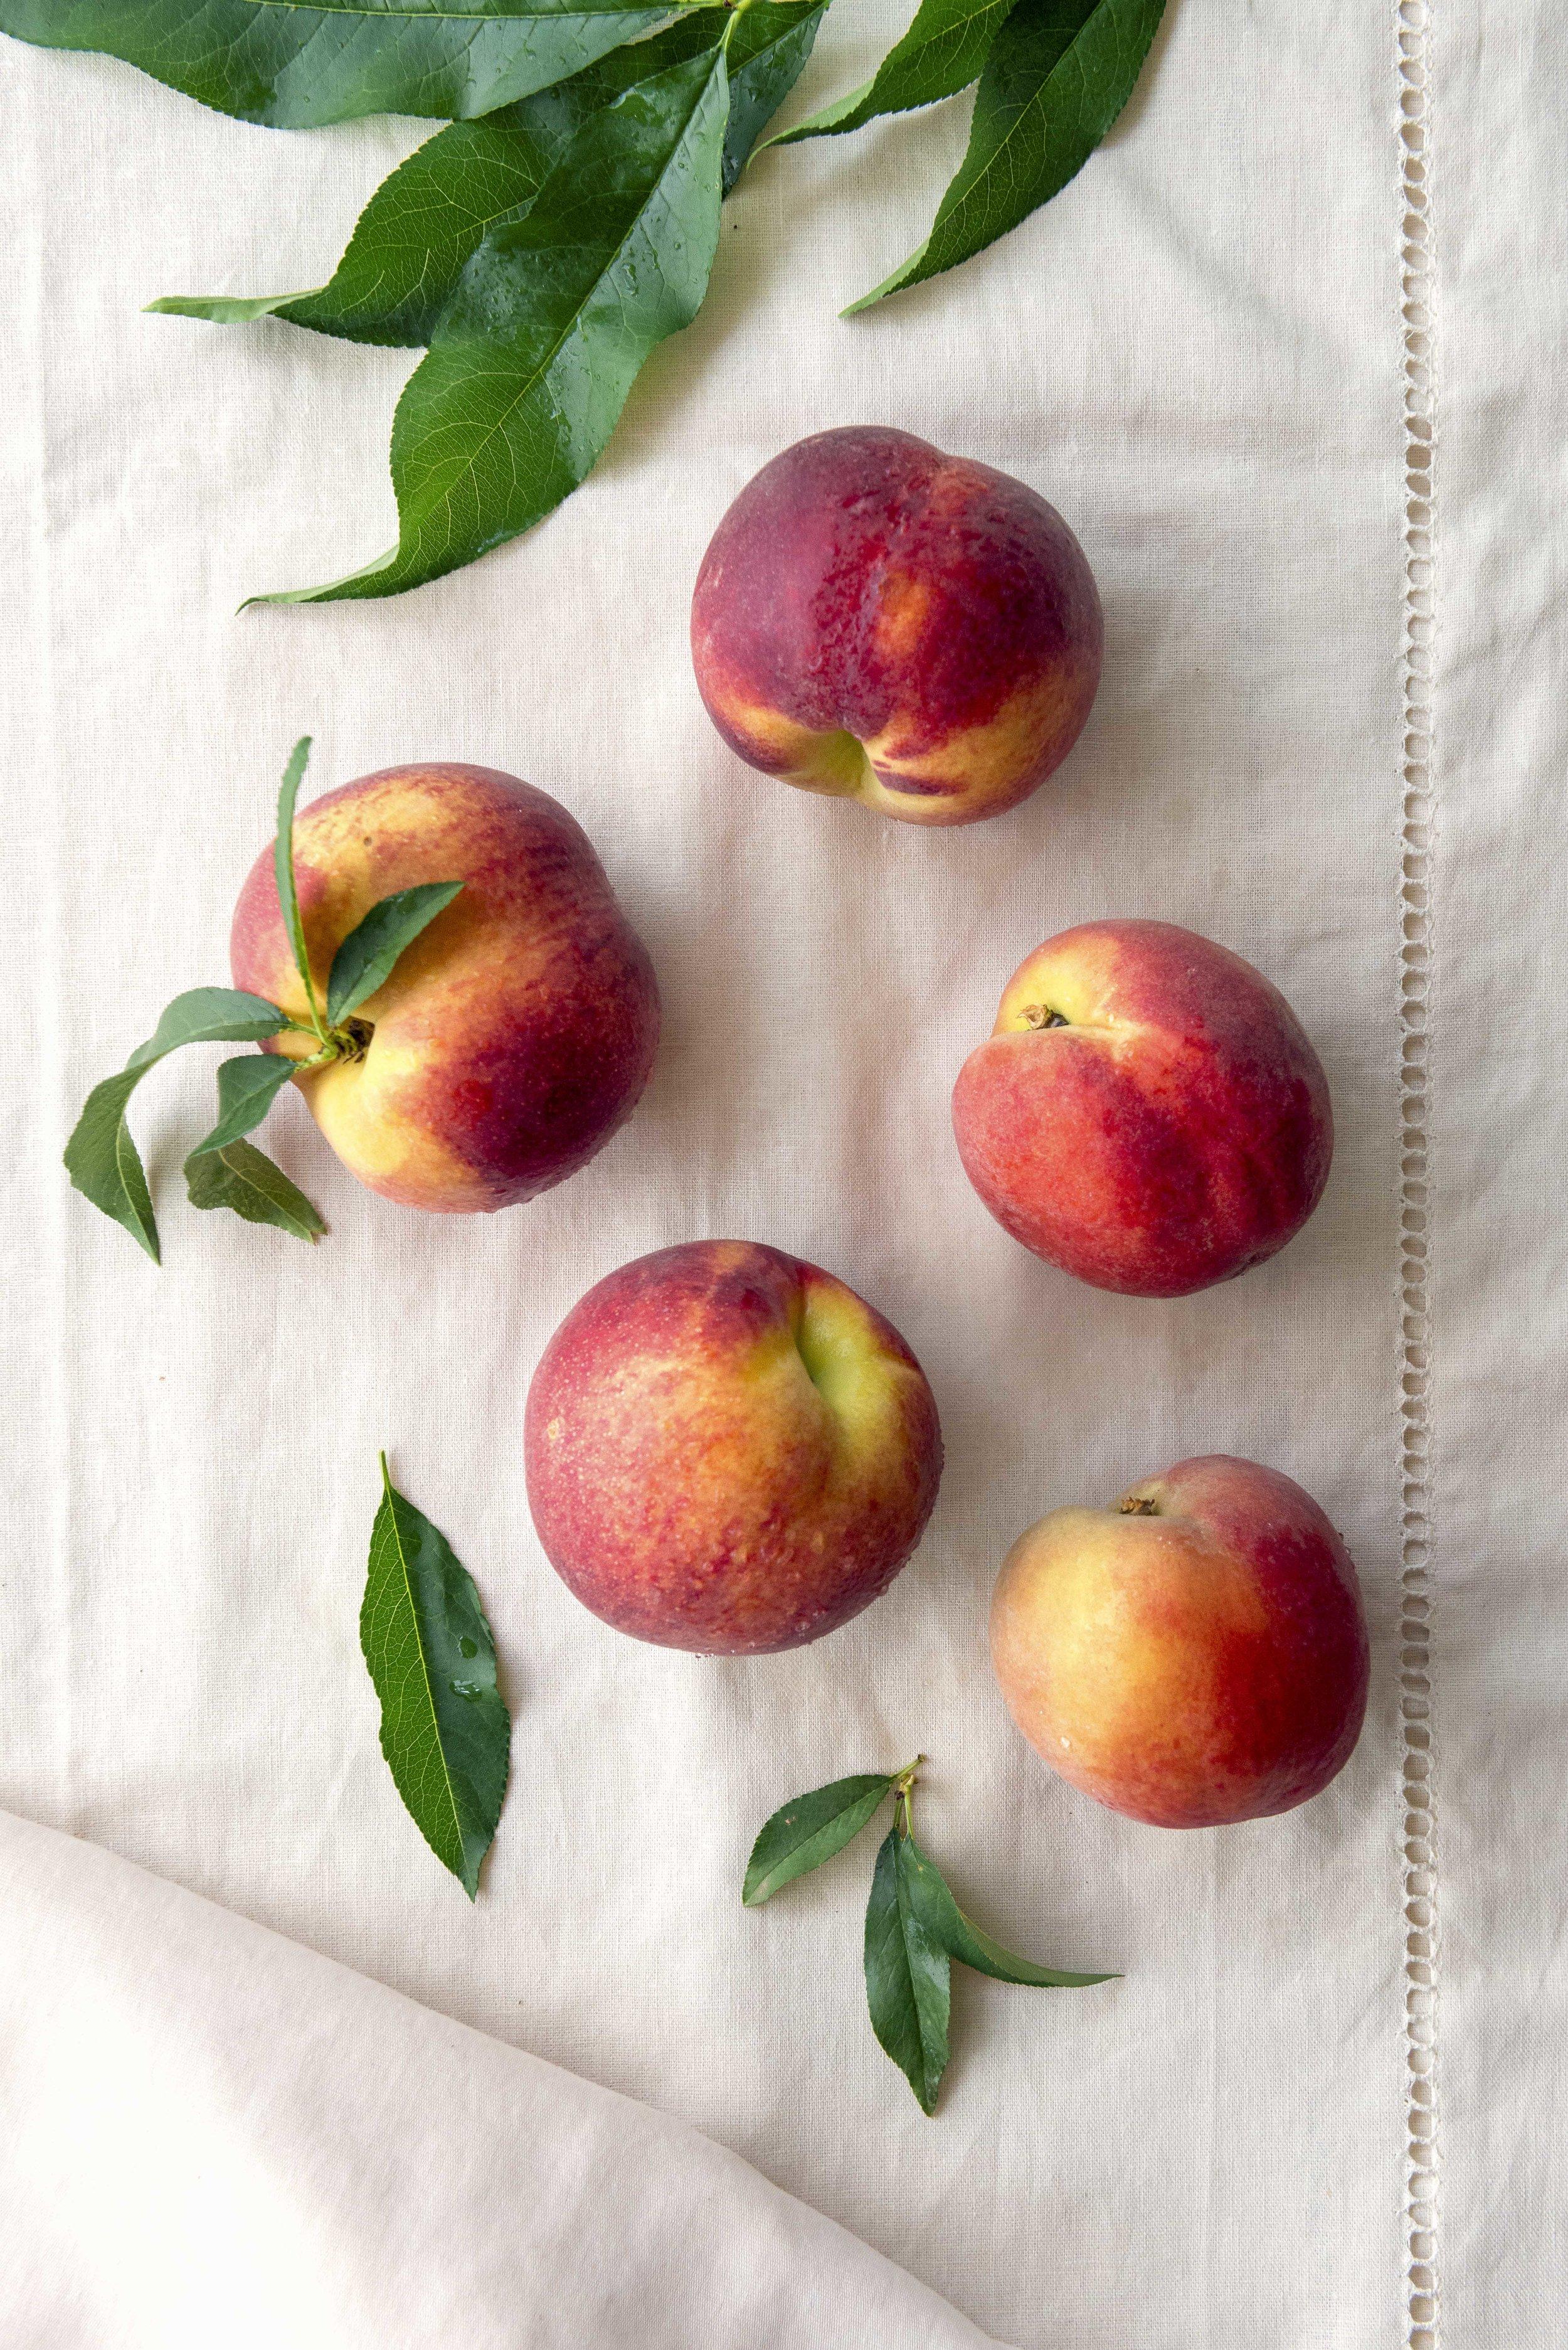 20150603-Tree Ripe Citrus Co Peach Project Paul Oemig Photography Lo-Res-Tree Ripe_0070_20150603-28.jpg